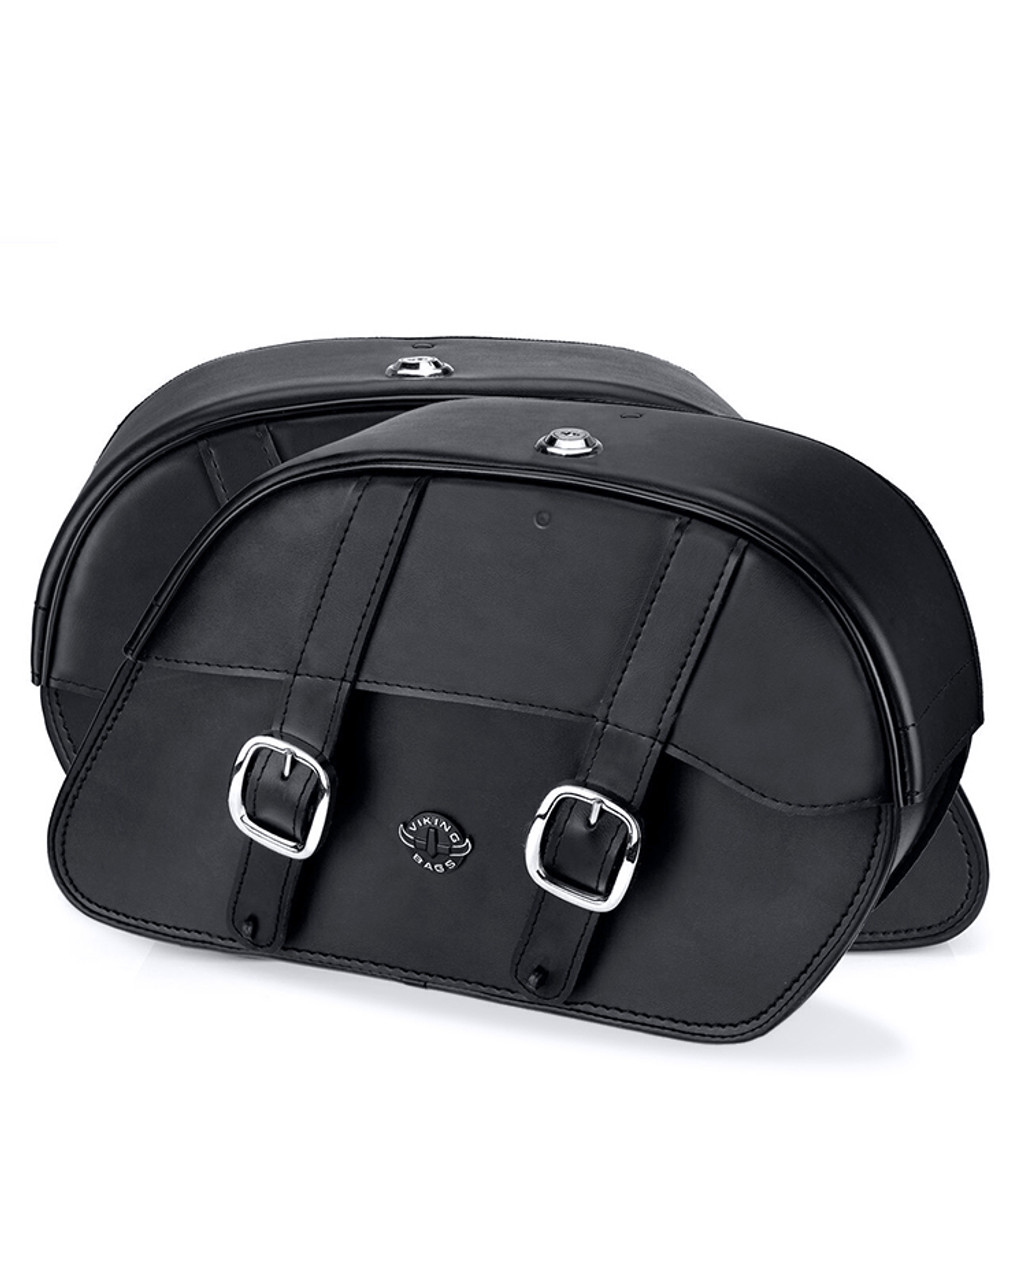 VikingBags Skarner Large Double Strap Leather Motorcycle Saddlebags For Harley Softail Cross Bones FLSTSB Both Bags View